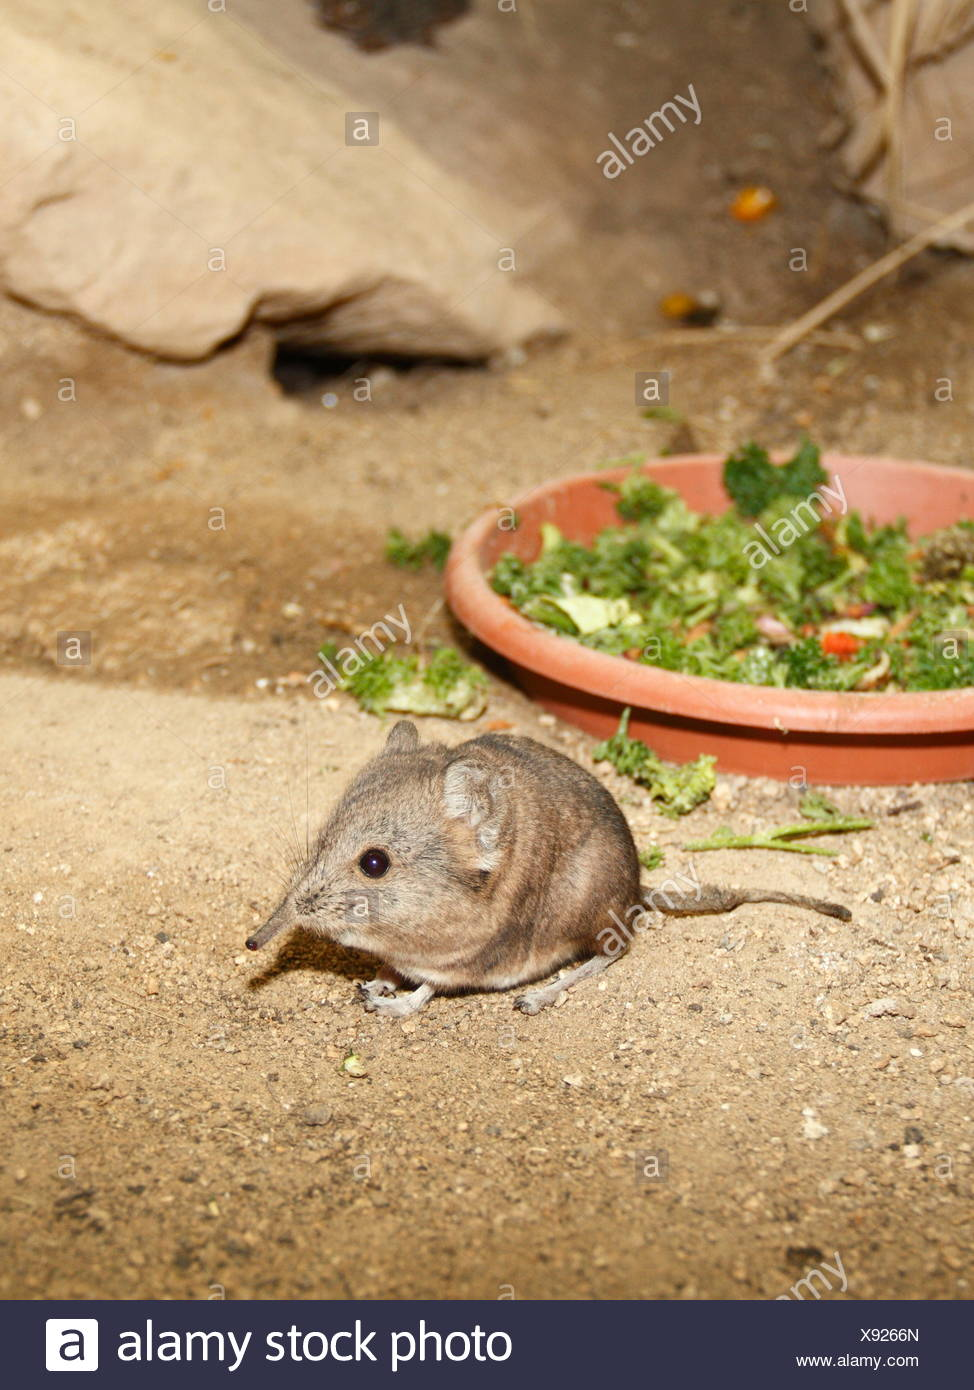 elephant shrews - Stock Image